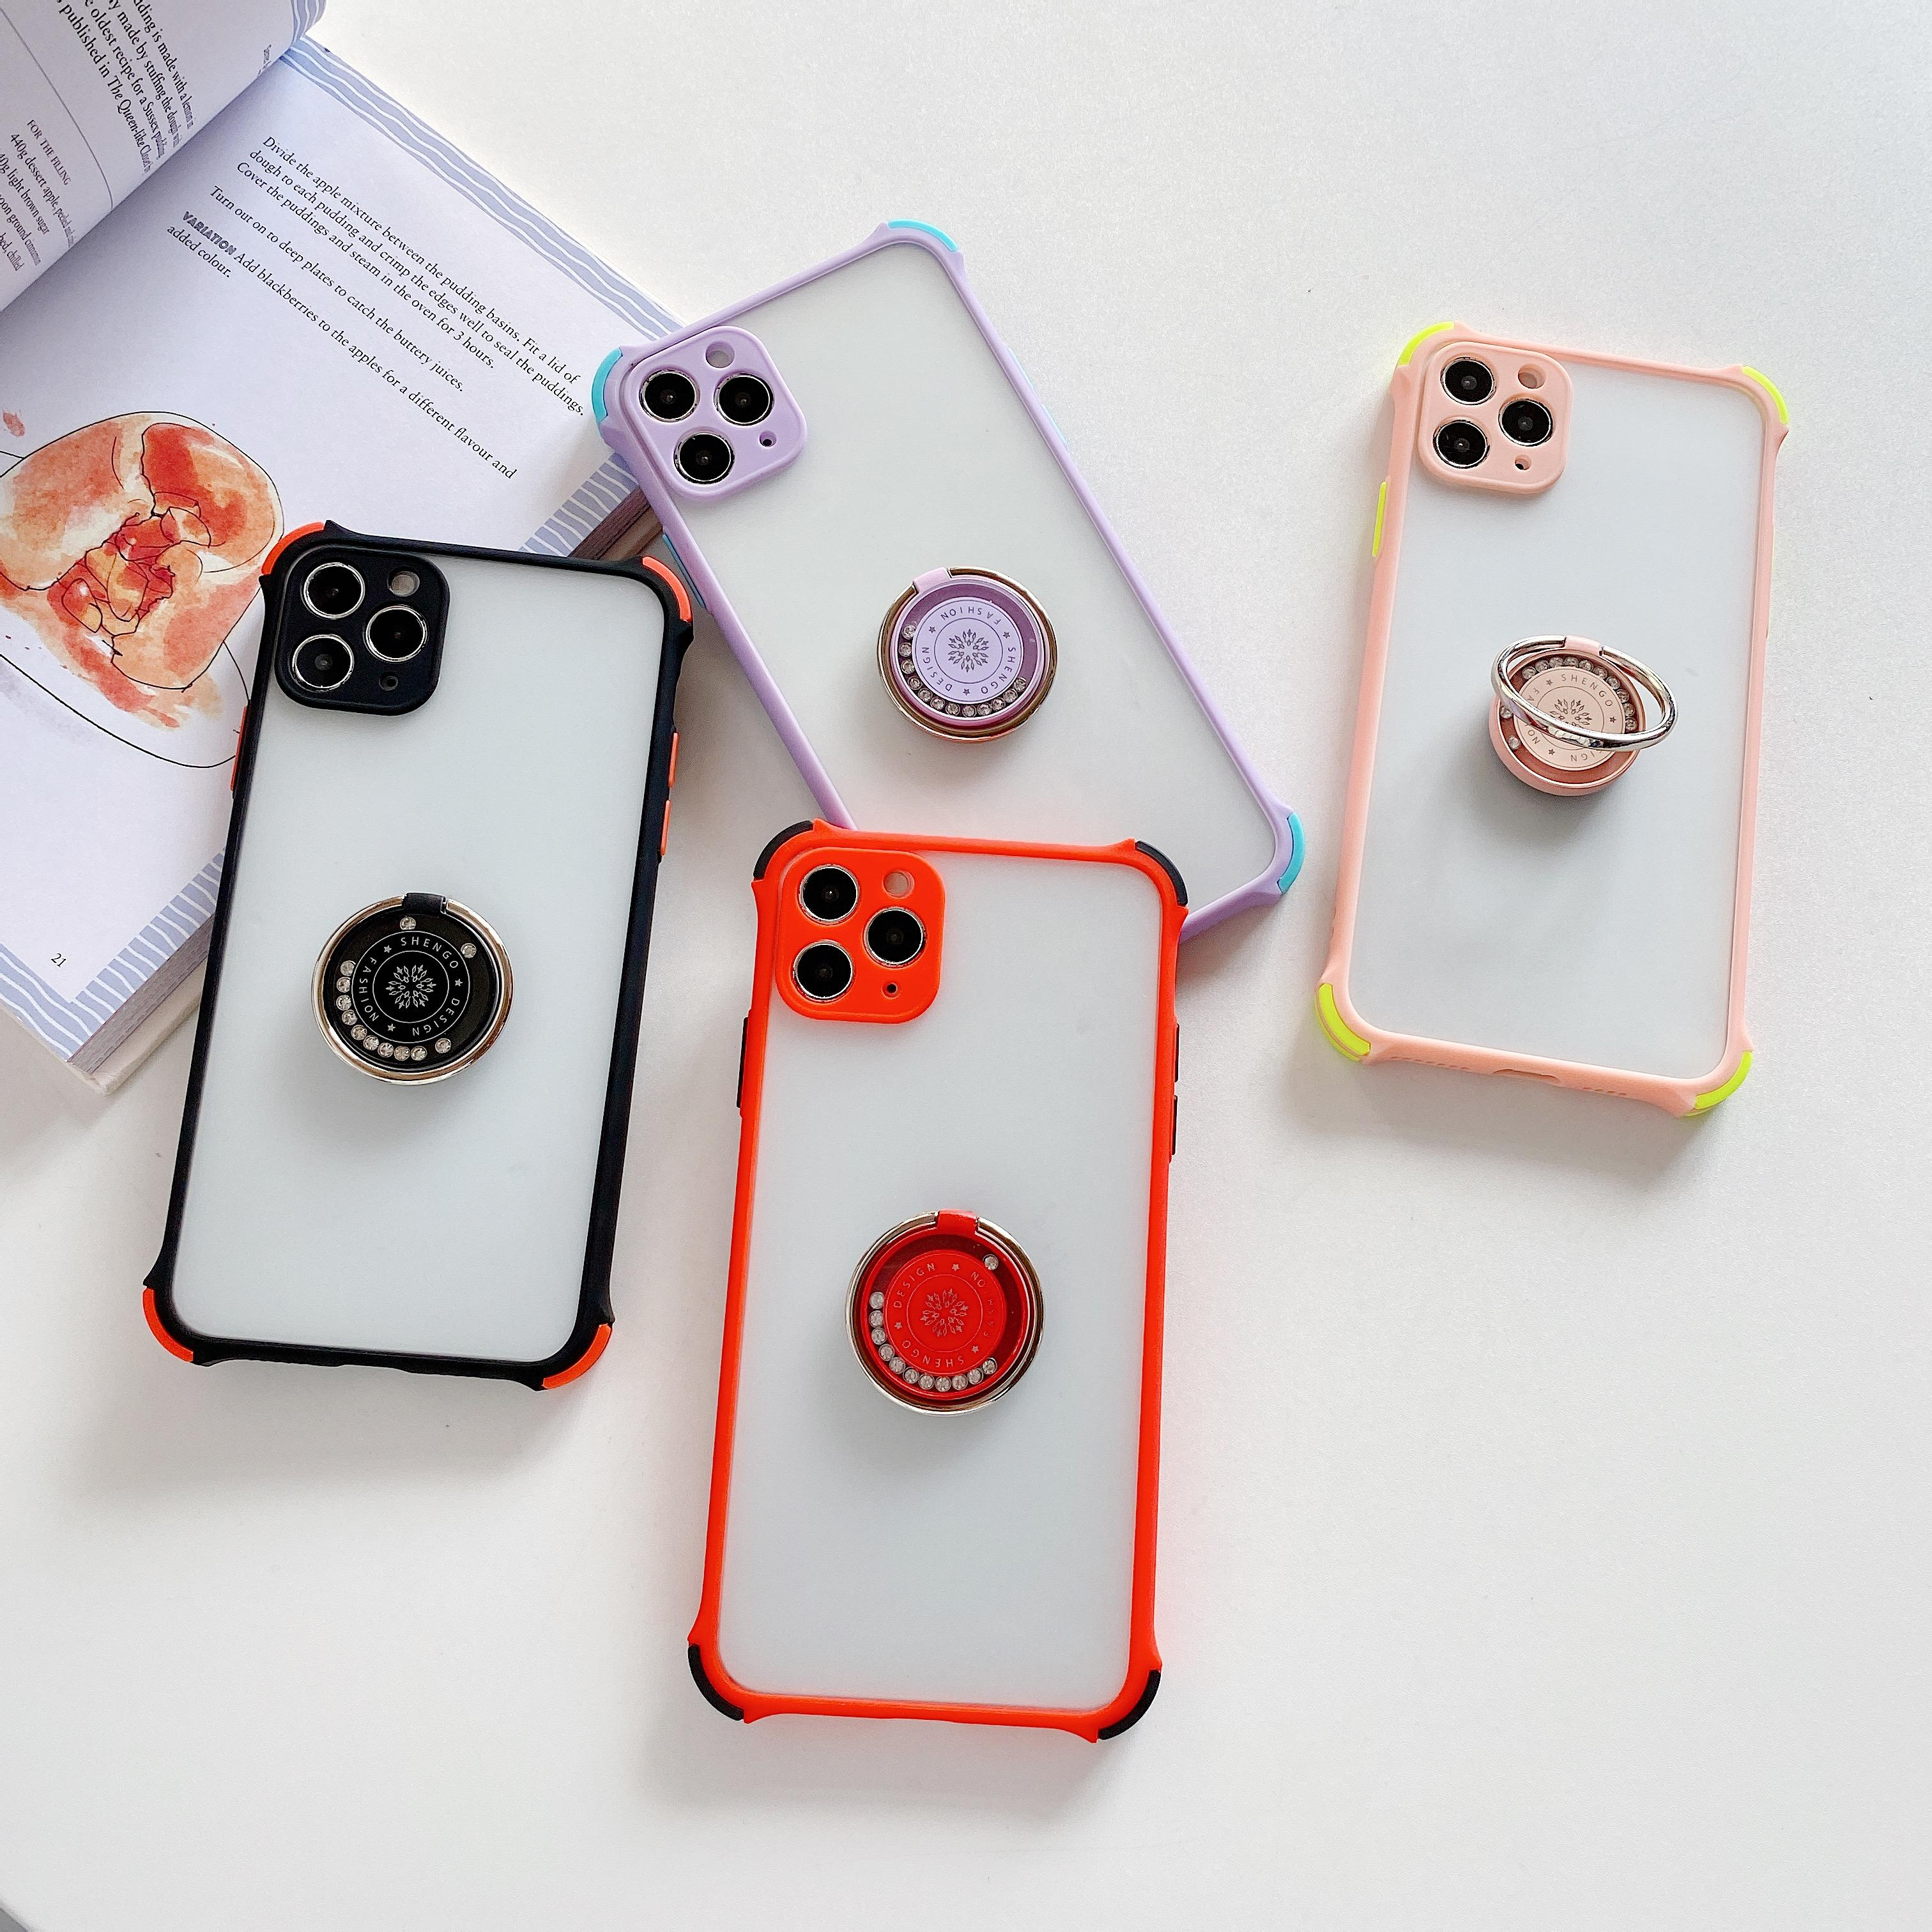 Kickstand С Finger Ring Phone Case для iPhone12 про Макса 12pro iPhone11promax 11Pro Xsmax XR Xs 8Plus